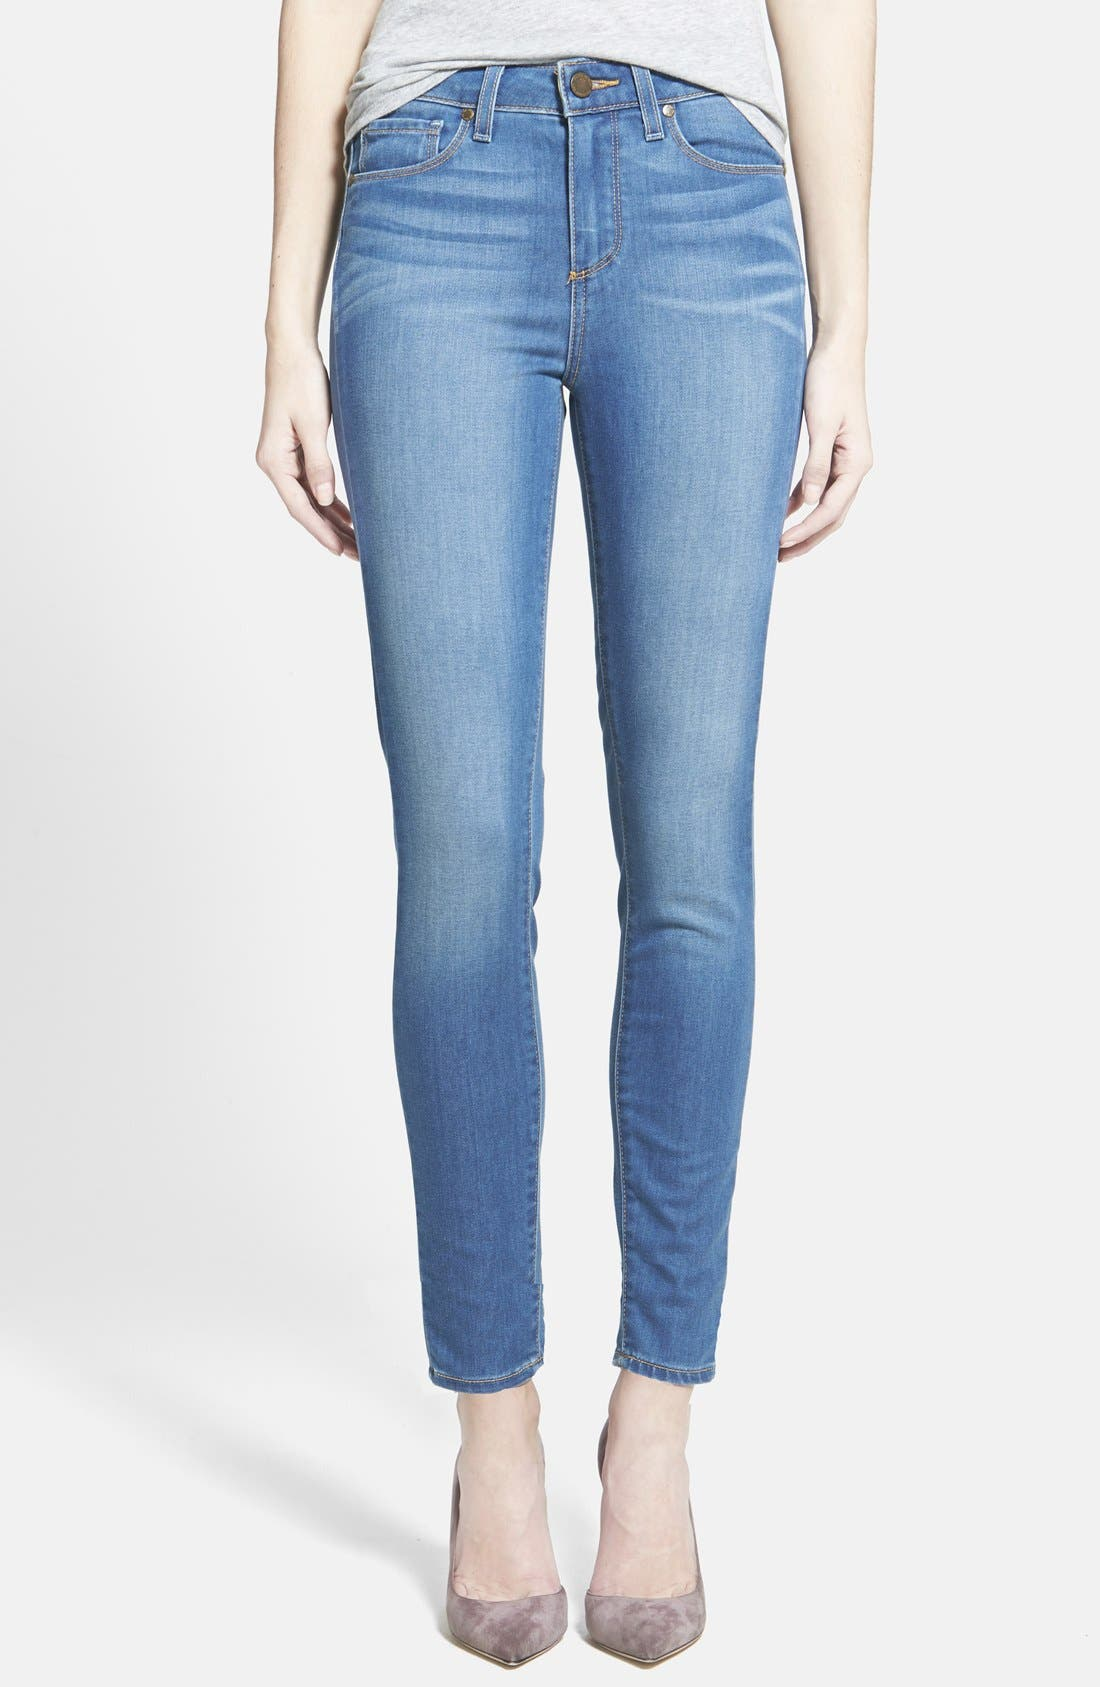 Alternate Image 1 Selected - Paige Denim 'Hoxton' Skinny Ankle Jeans (Halstead Blue)